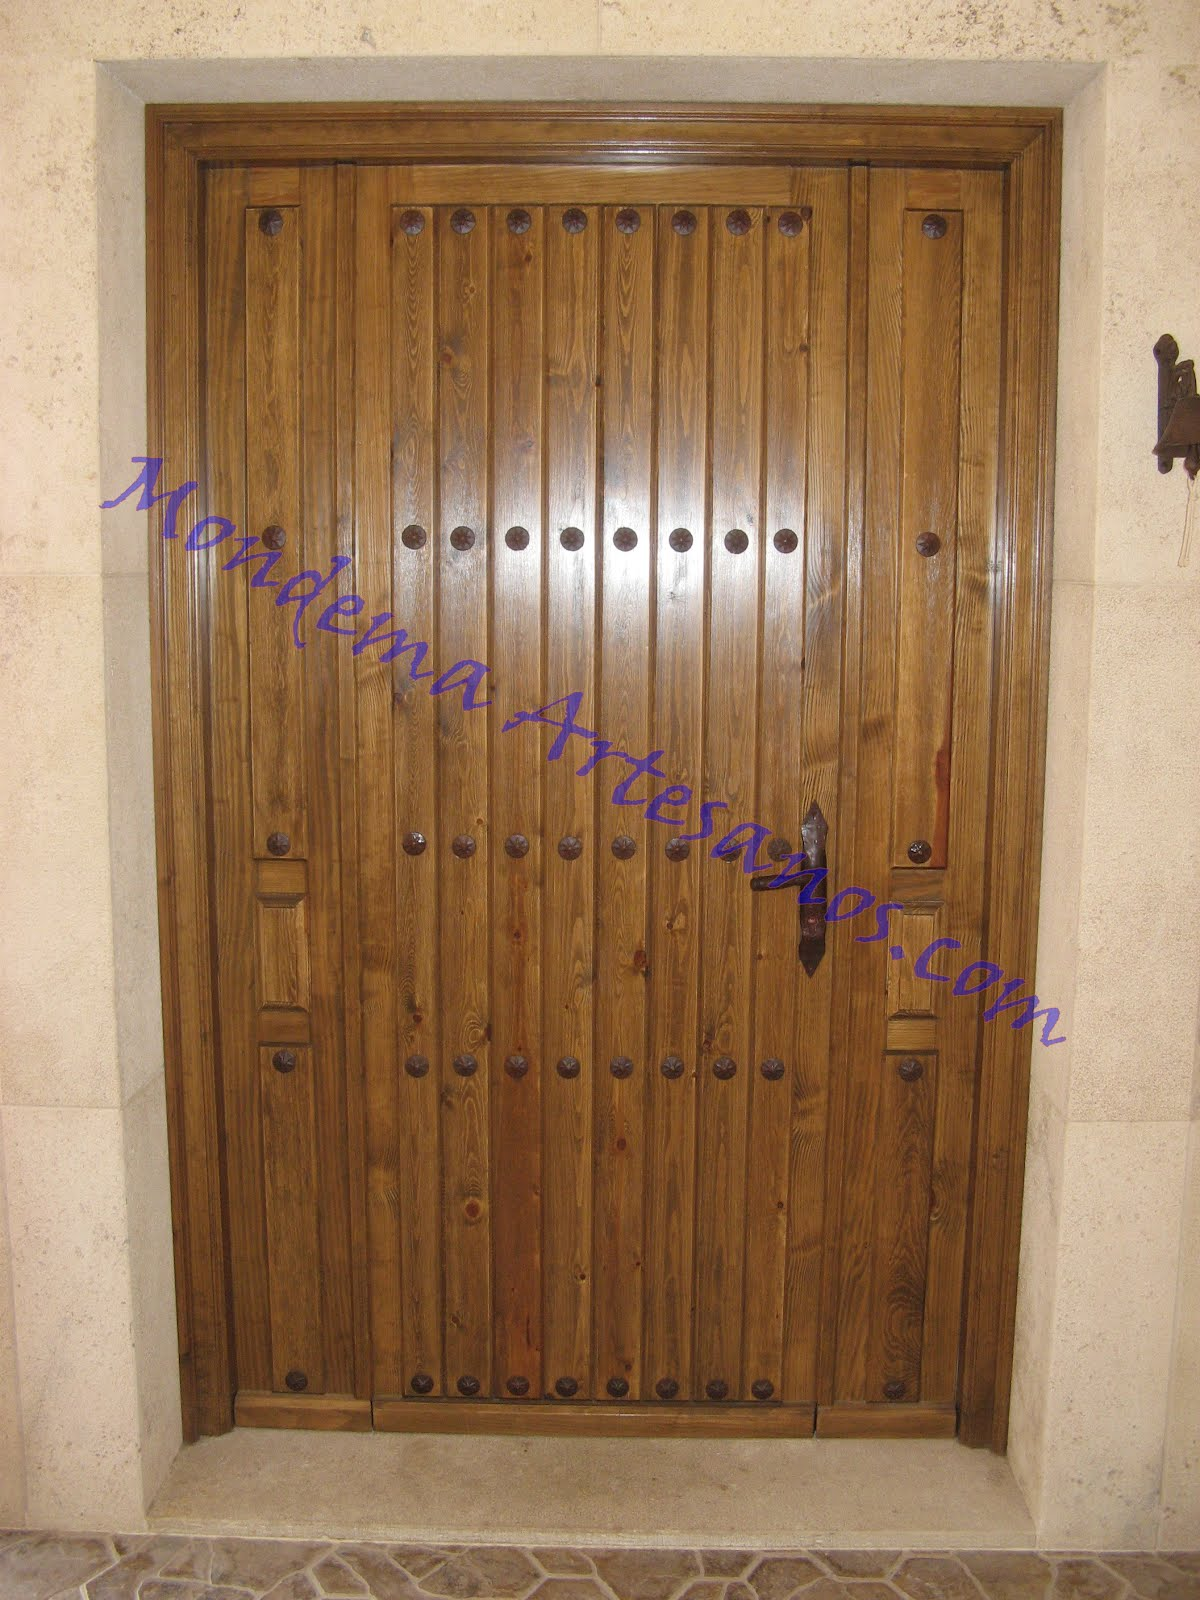 Puerta de exterior r stica artesanos carpinteros - Puerta rustica exterior ...